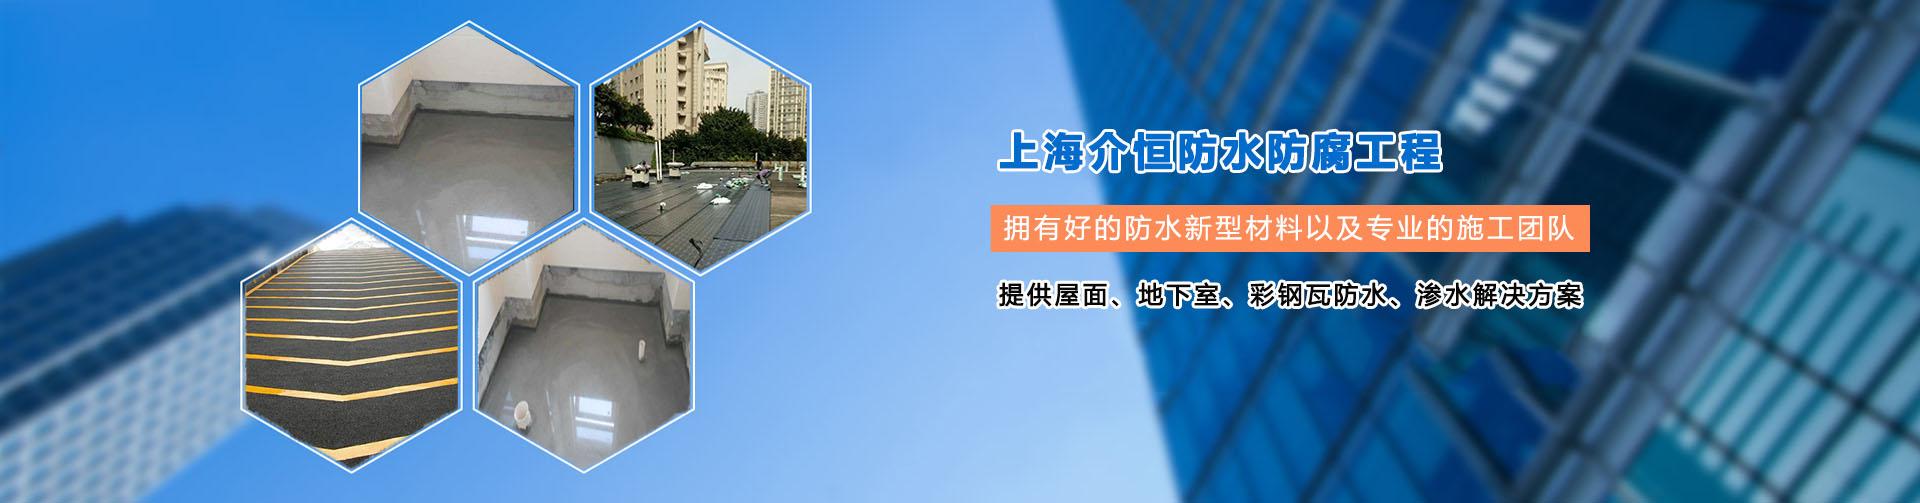 上海地下室防水